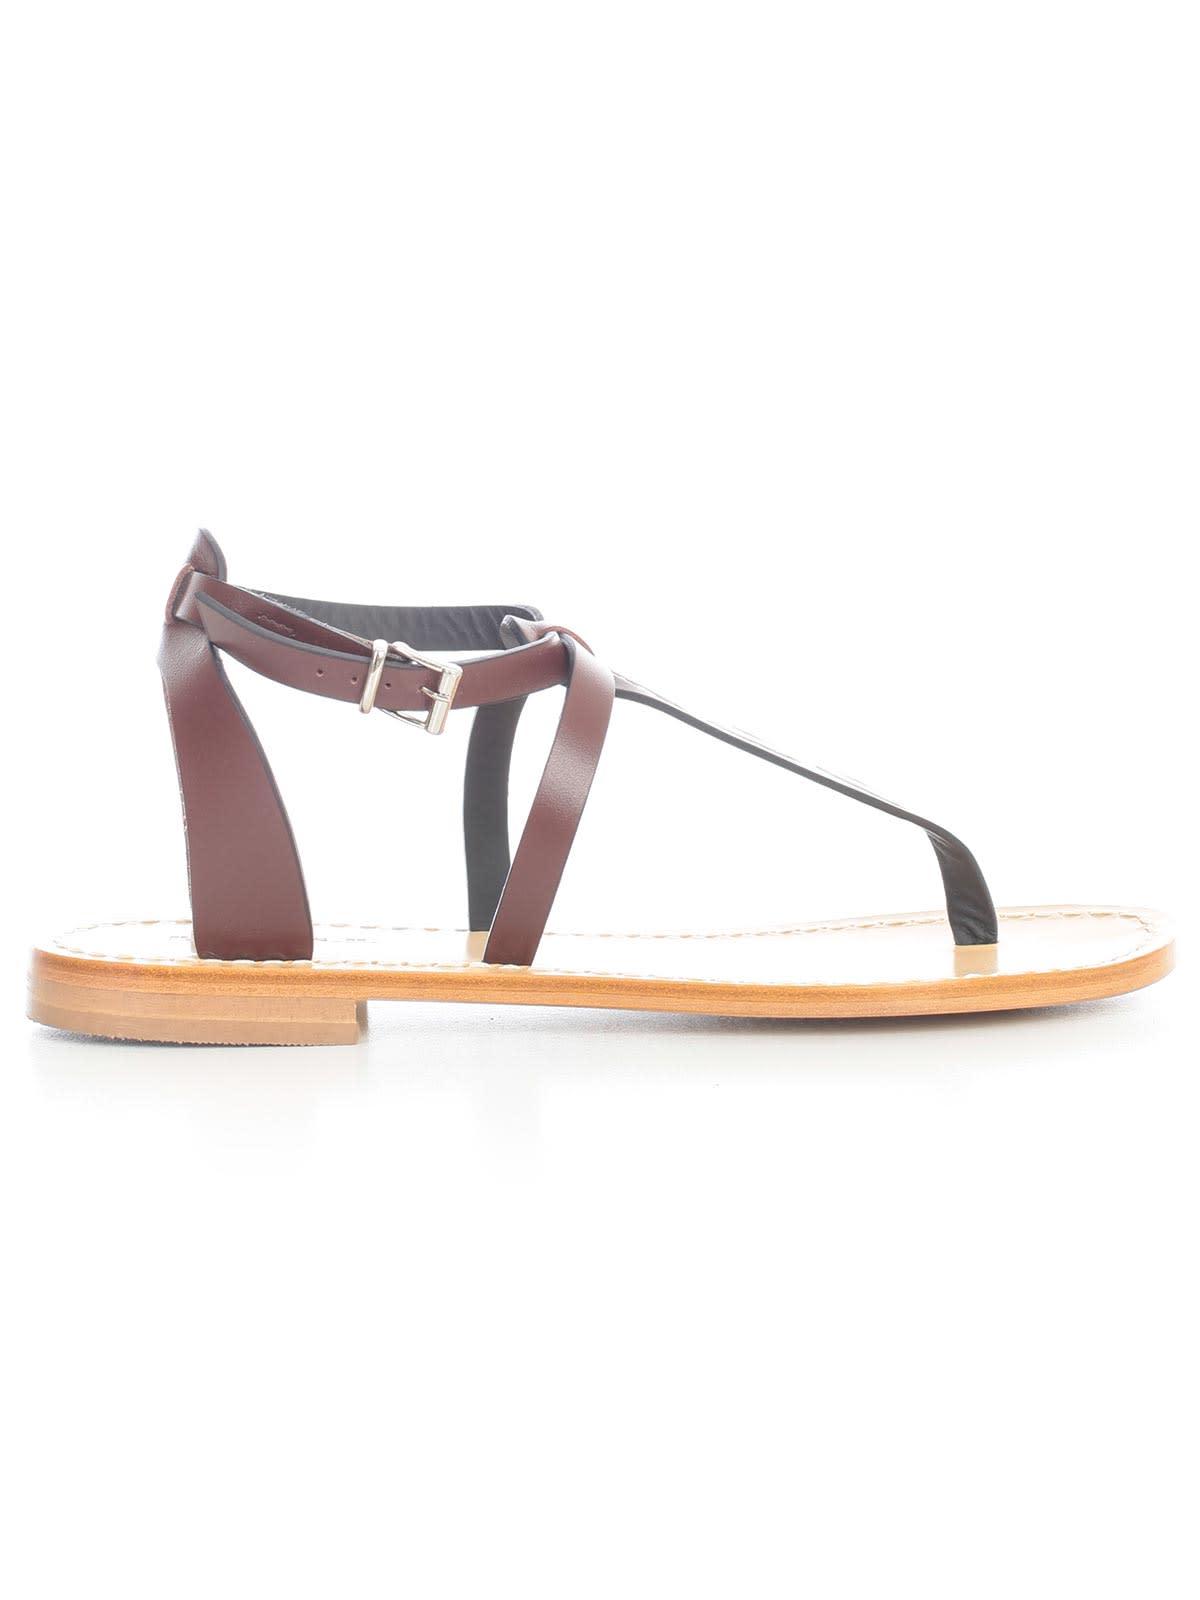 Parosh Sandals Flip Flops